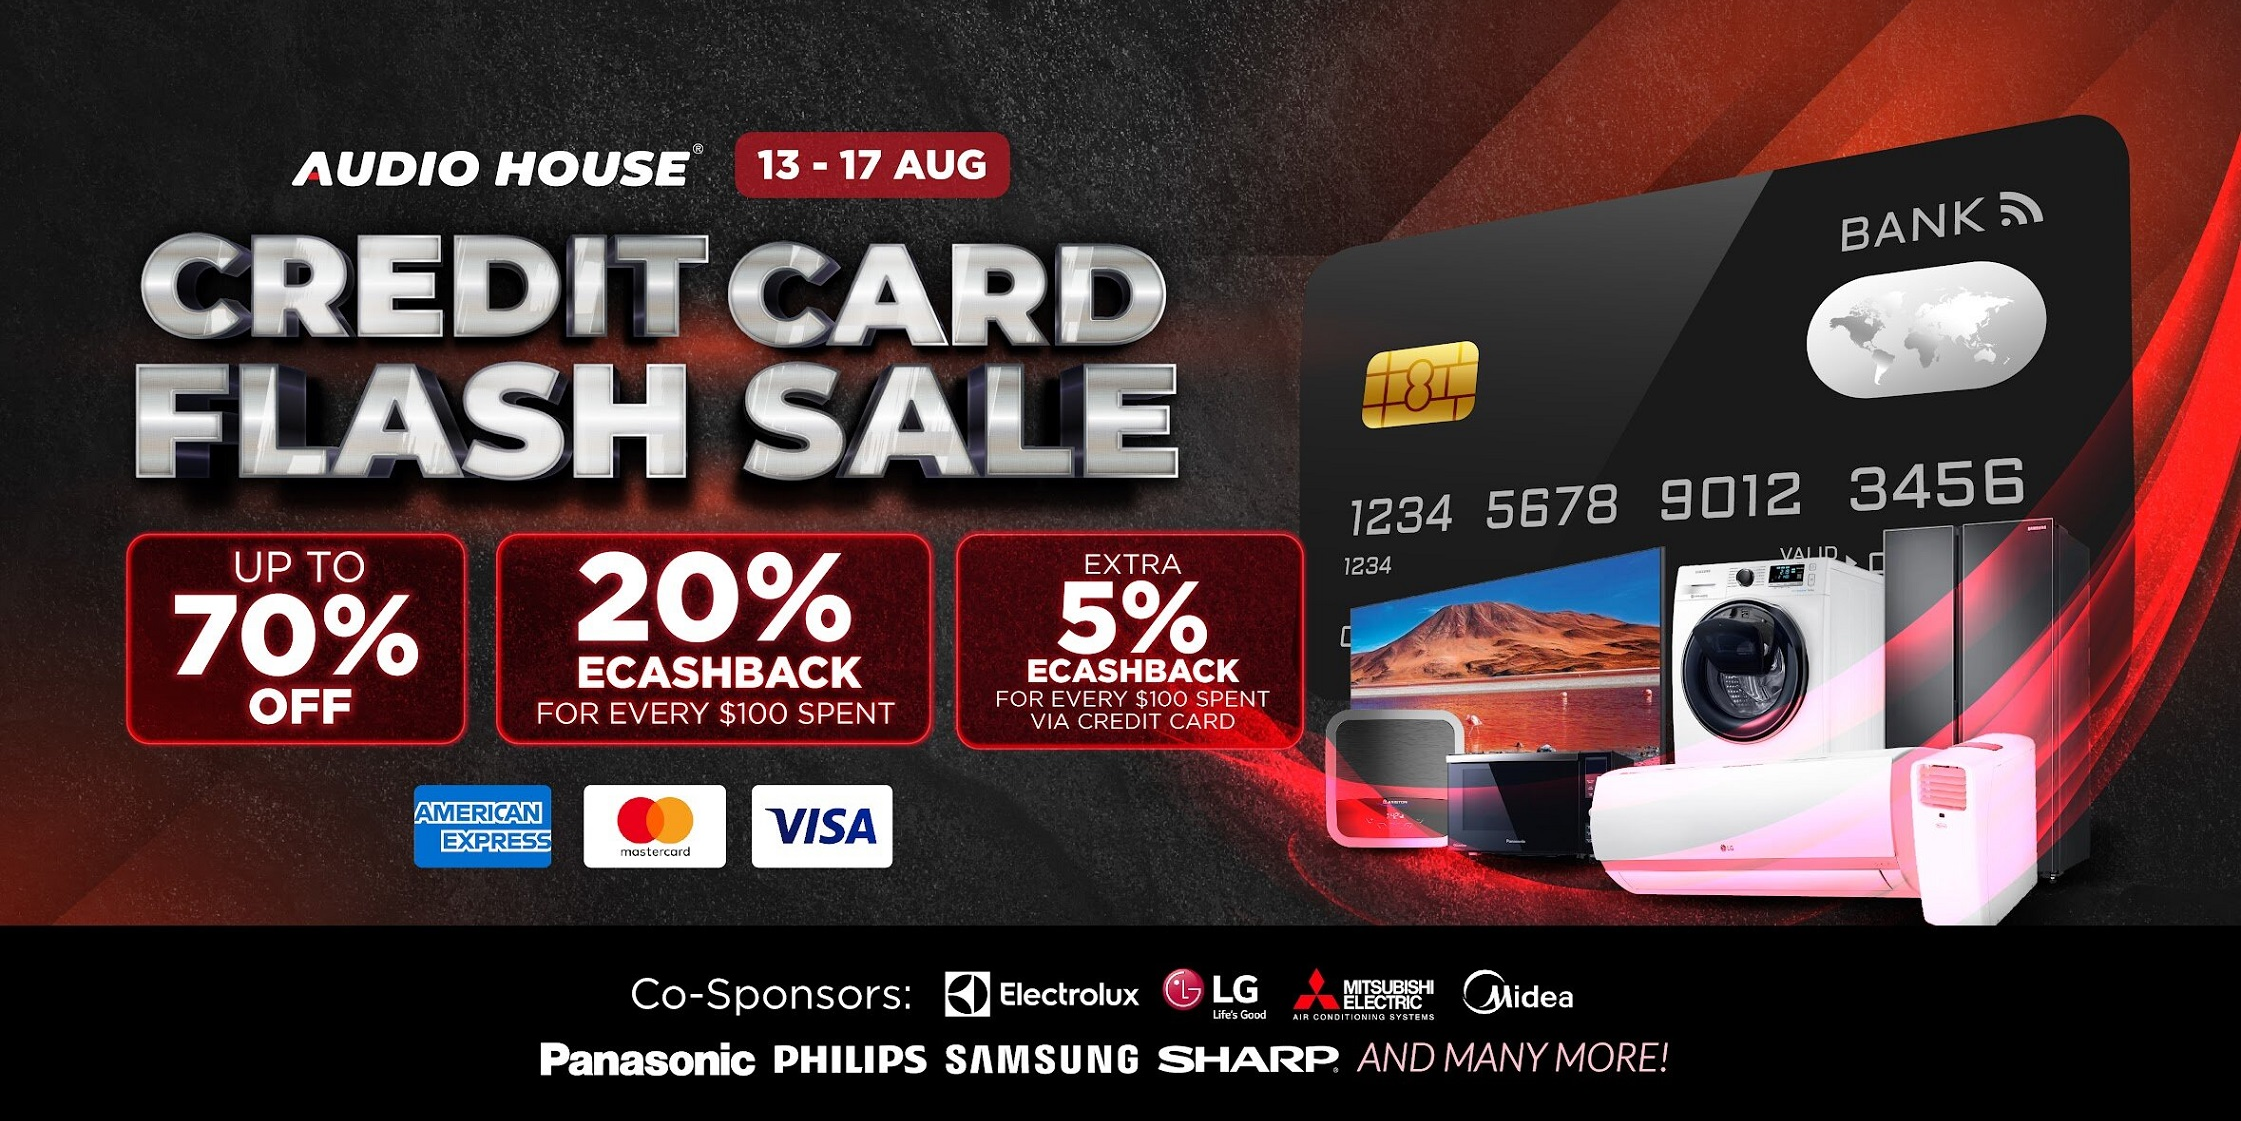 [Audio House Credit Card Flash Sale] Get 20% eCashback* + Extra 5% eCashback* Spent Via Credit Card